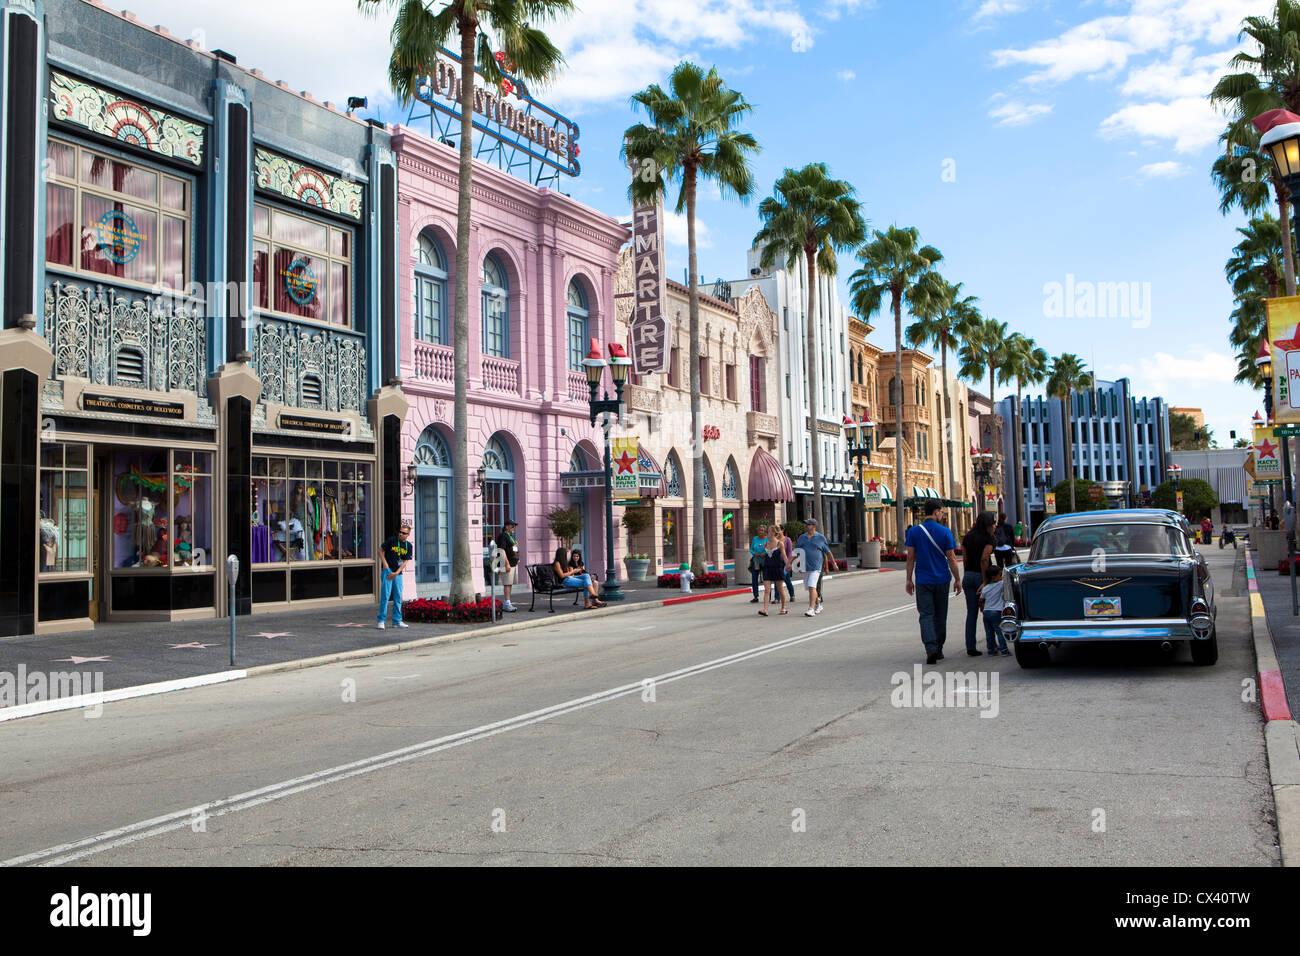 Universal Studios theme park Orlando Florida USA - Stock Image